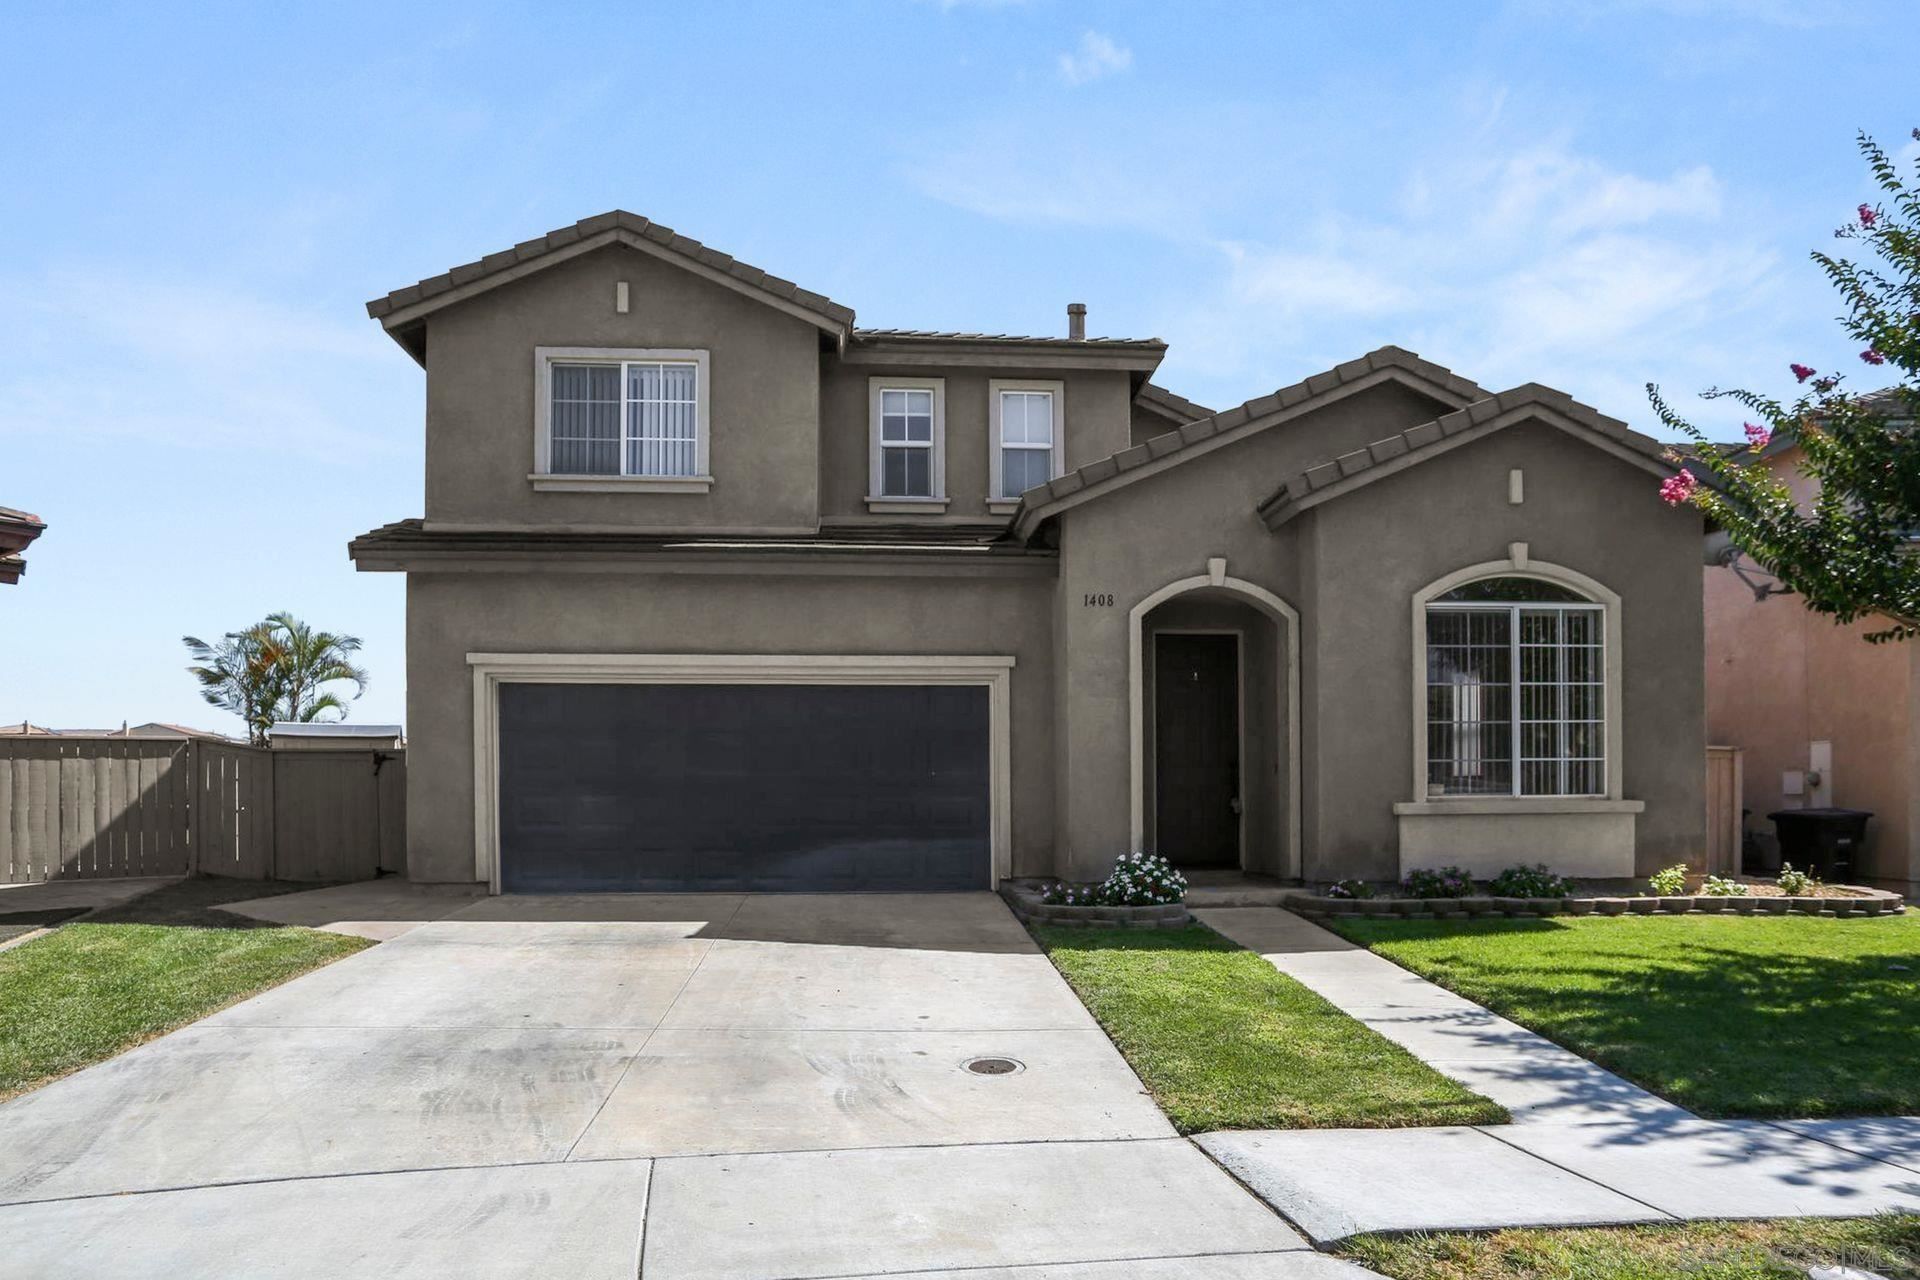 Photo of 1408 Pearson Springs Ct, Chula Vista, CA 91913 (MLS # 210026625)